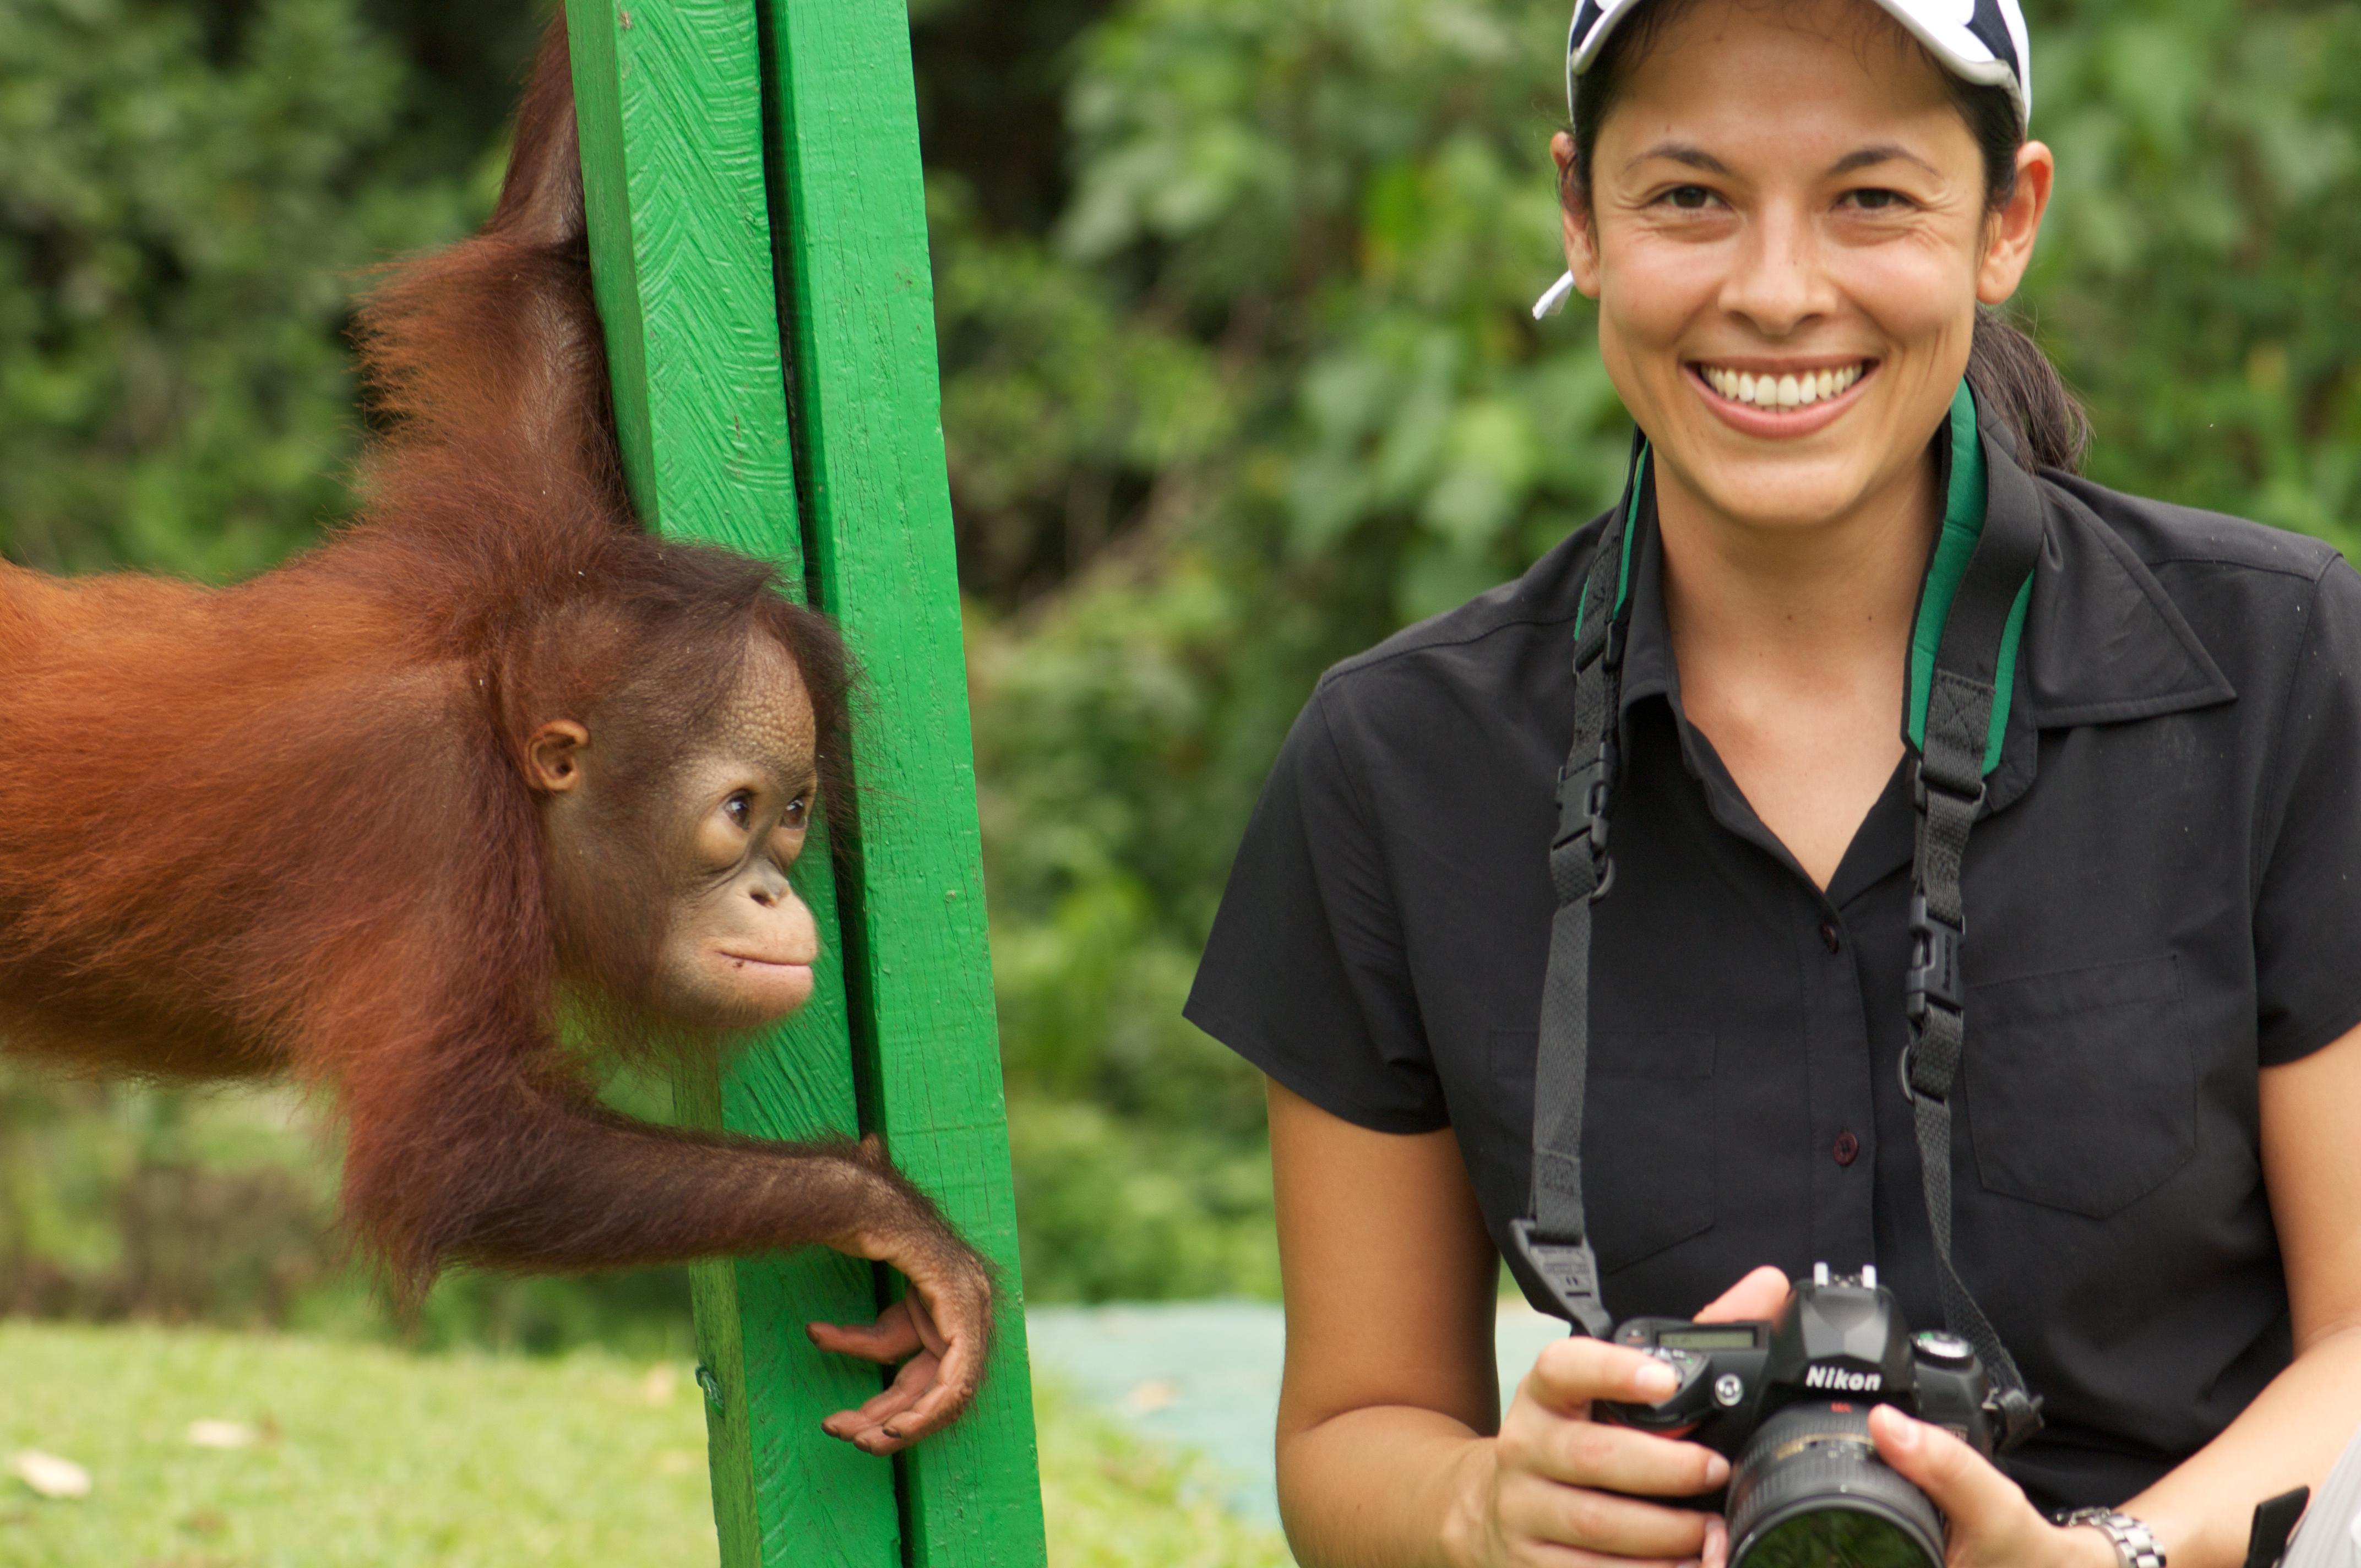 LT & baby ape